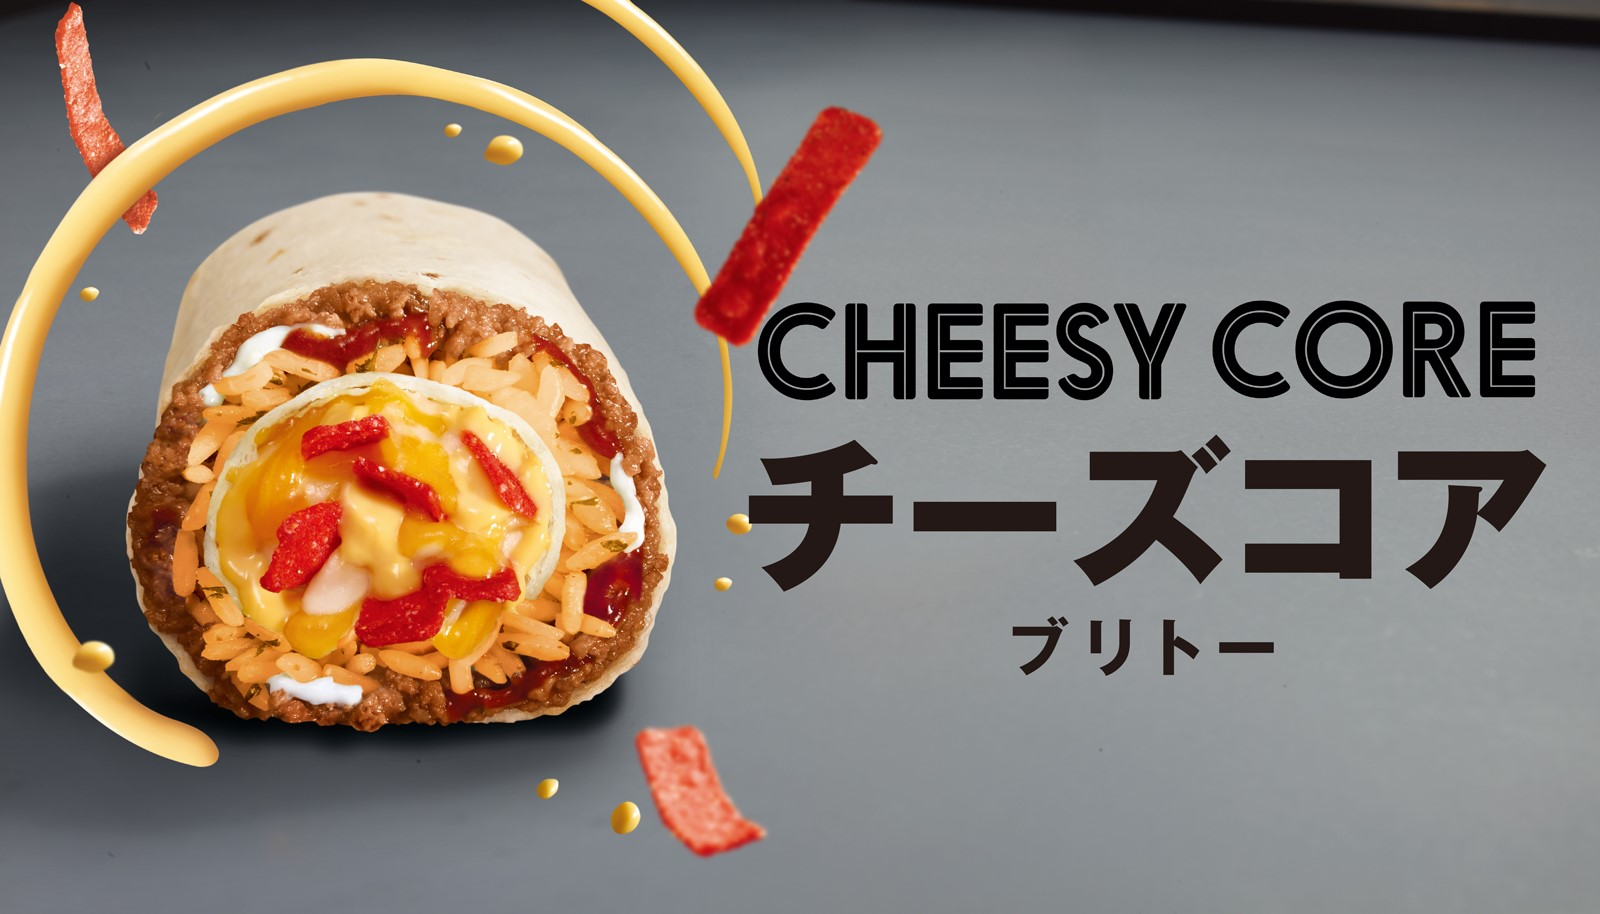 Cheesy Core